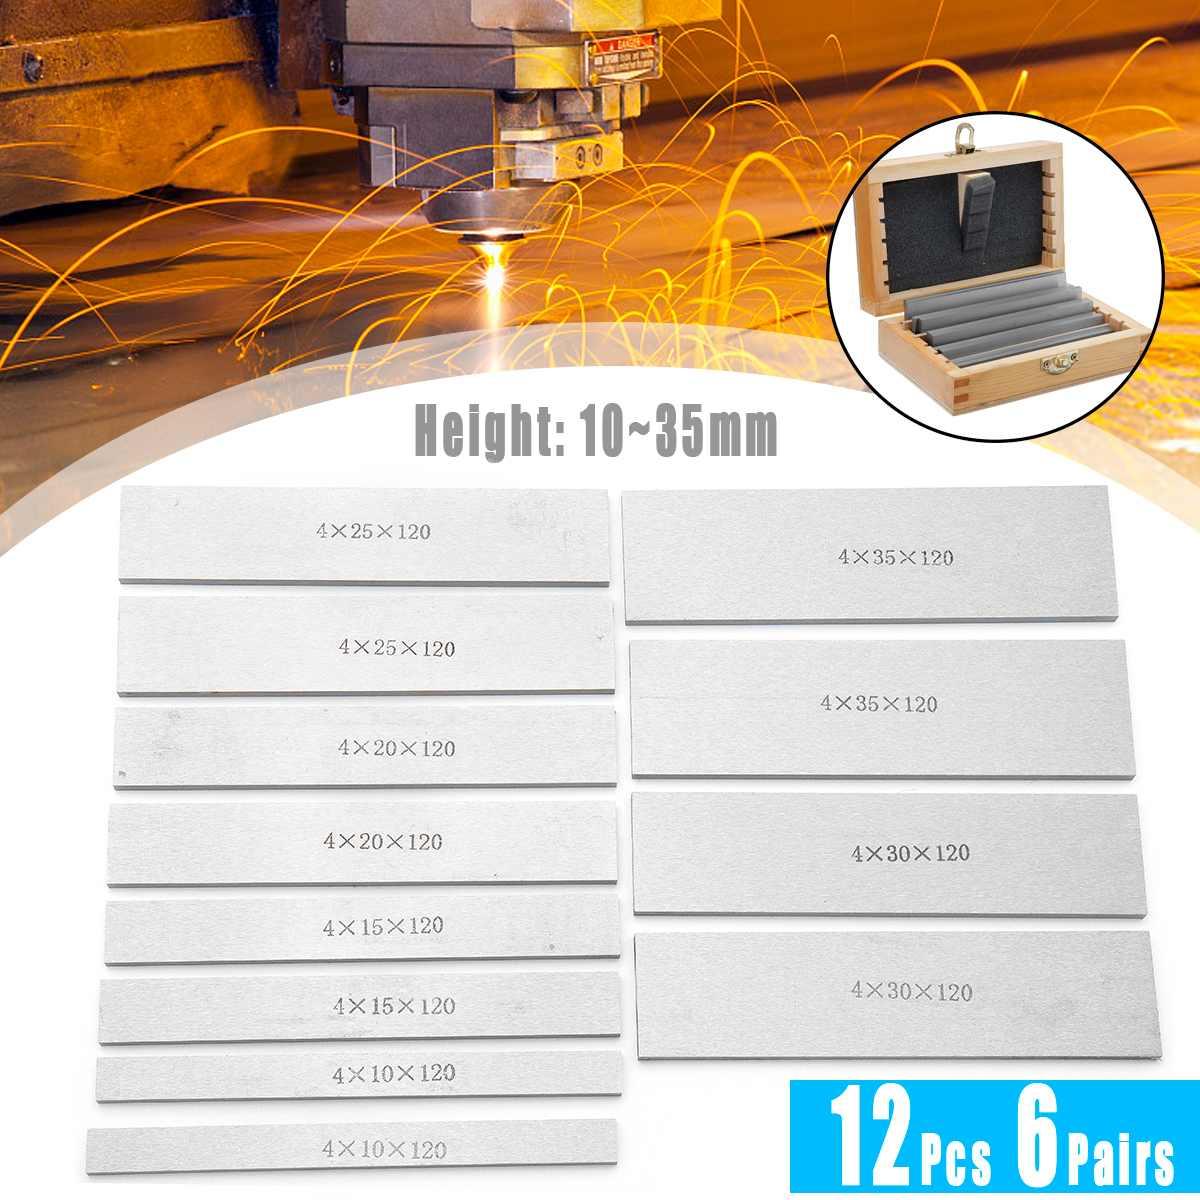 6 Pairs 12Pcs Parallel Pad Gauge Block Alloy Steel CNC Milling Pads Set 120mm X (10-35mm) Ideal For Vice Milling Machine Lathe